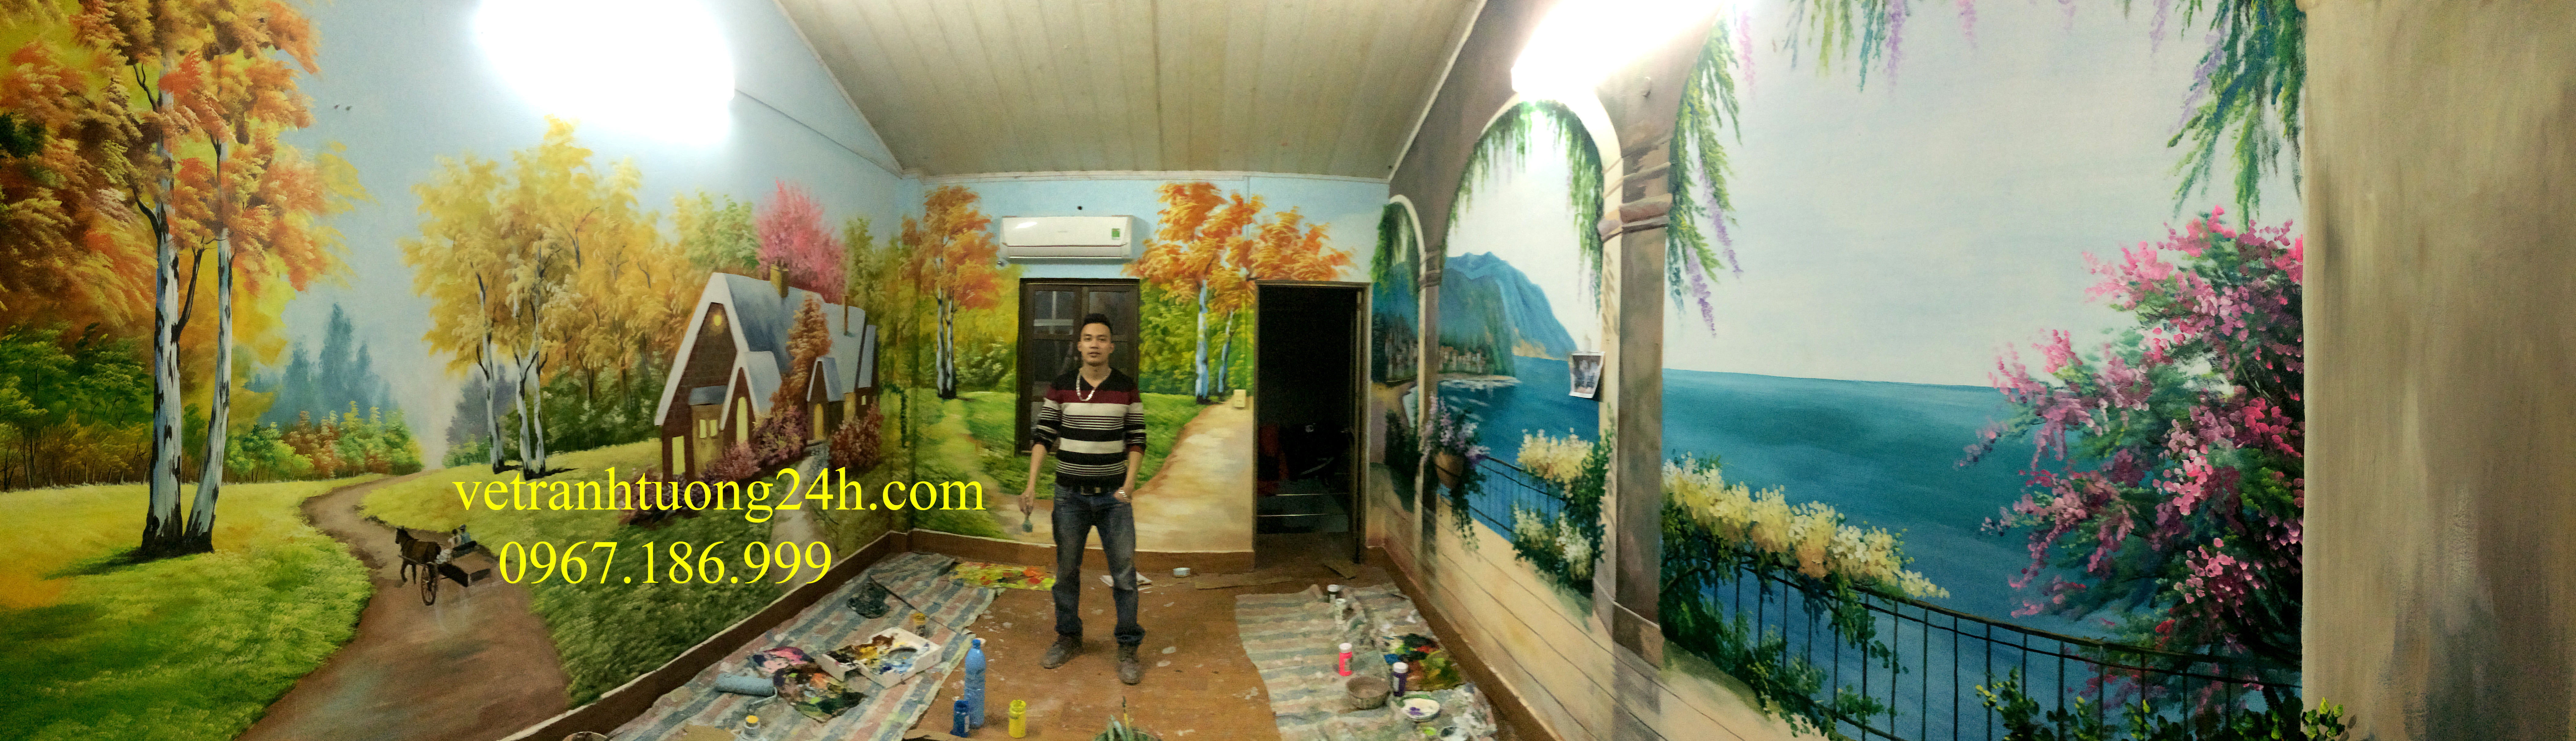 ve tranh tuong nha hangf cafe 3d